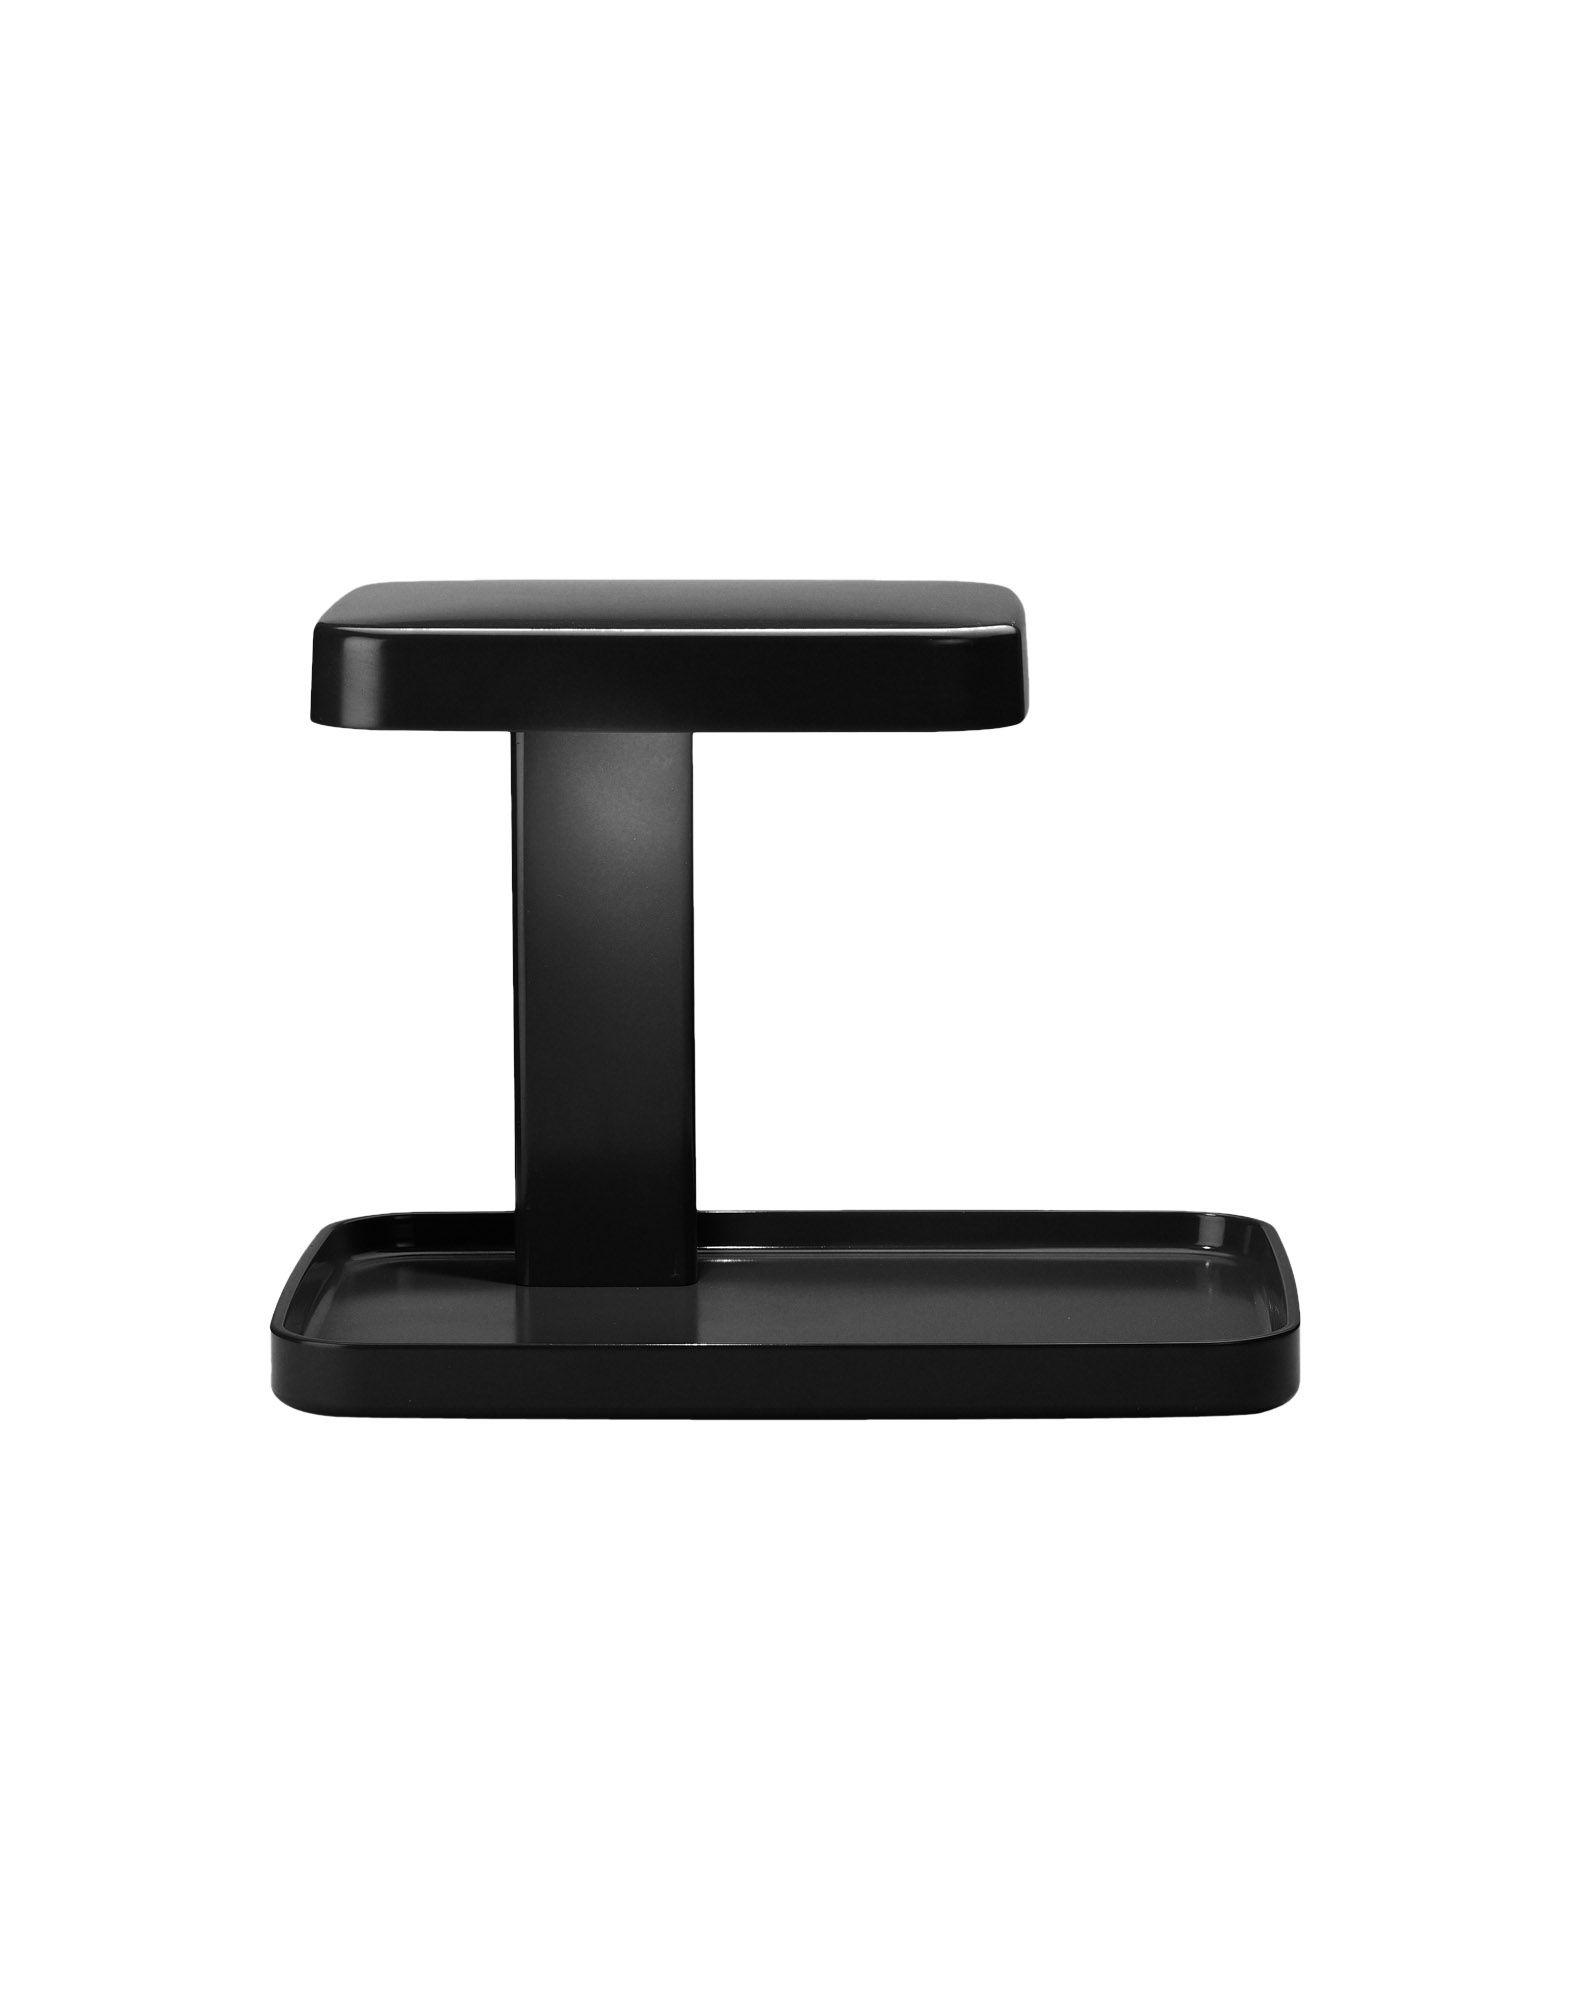 flos skygarden preisvergleich die besten angebote online. Black Bedroom Furniture Sets. Home Design Ideas